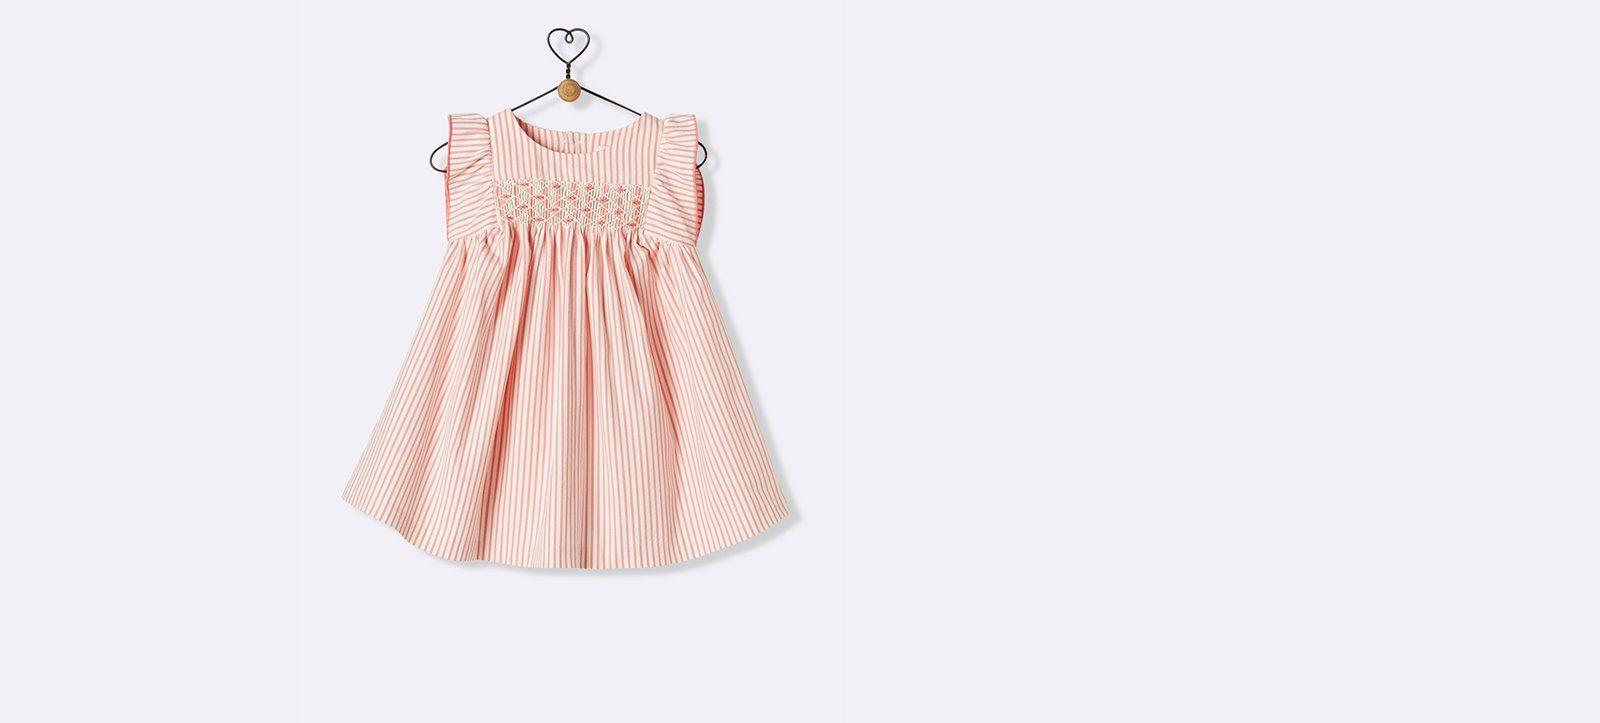 24843435f1c6d Robe à smocks bébé - Imprimé Cerisier+Rayé rose écru - 5